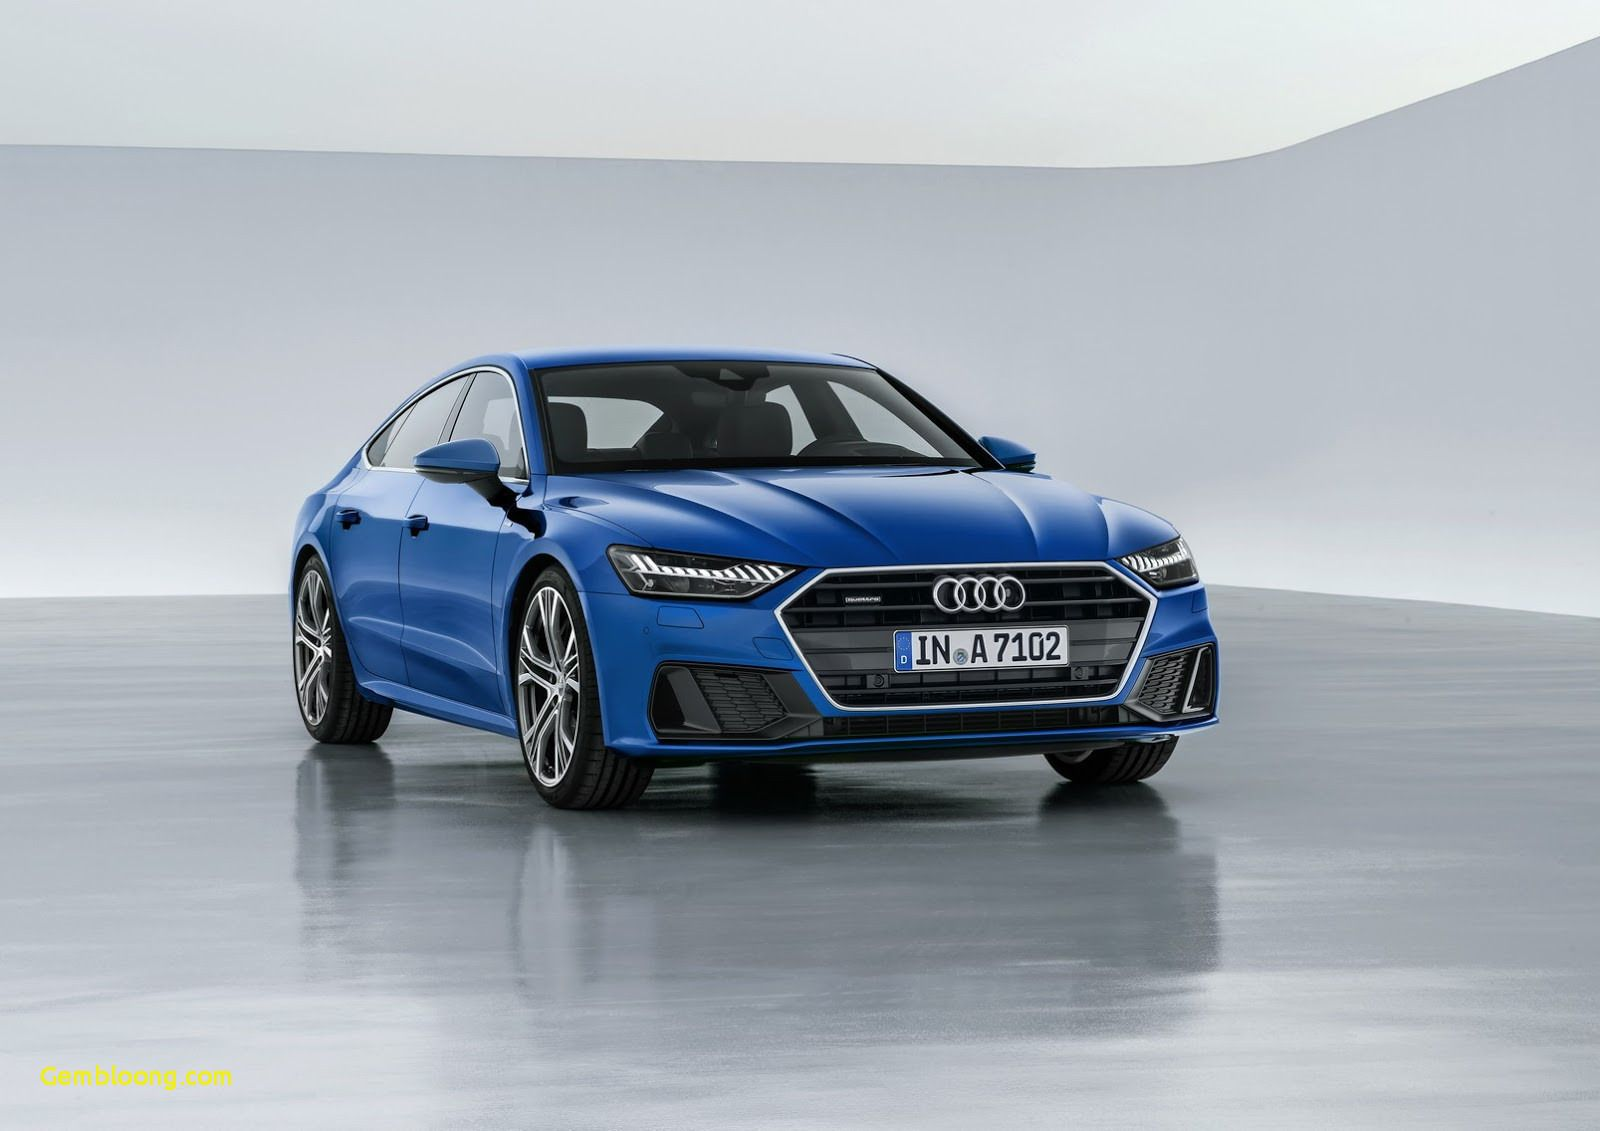 2020 Audi S7 2020 Audi S7 2020 Audi S7 2018 Jaguar Xf R Sport 2 0d Jaguar Audi